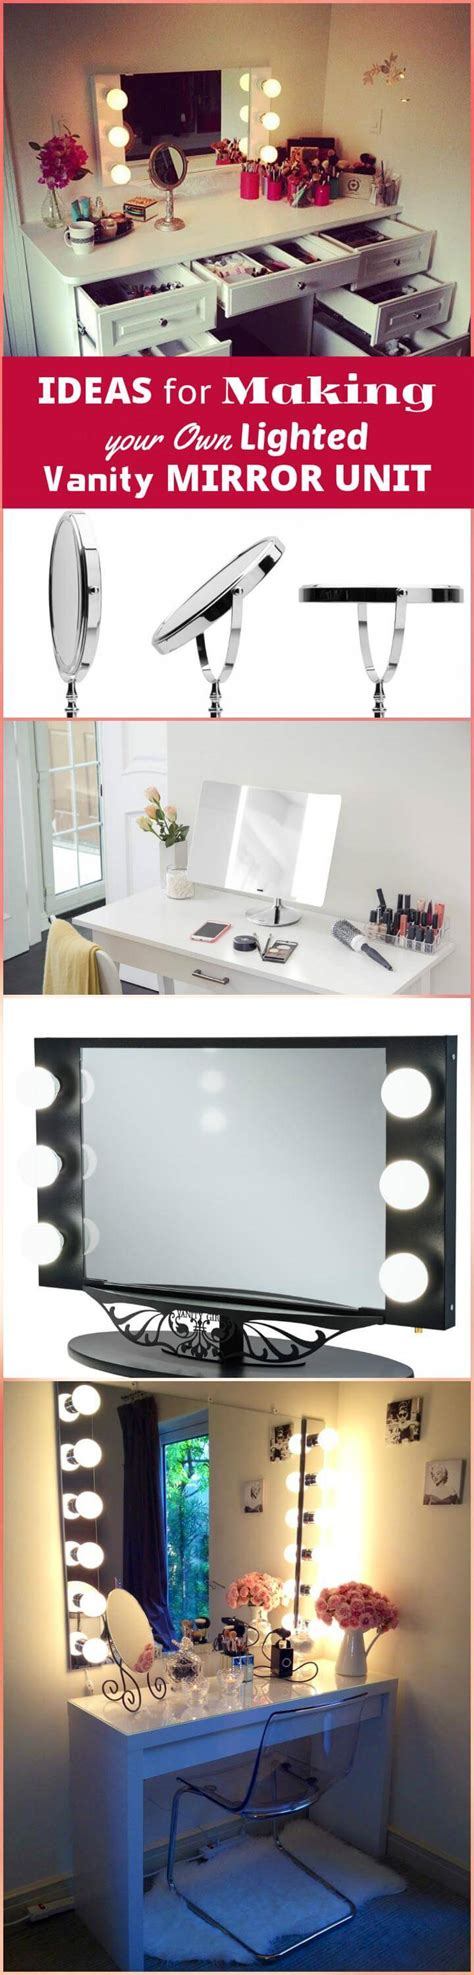 ideas for making your own vanity mirror with lights diy 20 diy makeup vanity tutorials diy your own makeup